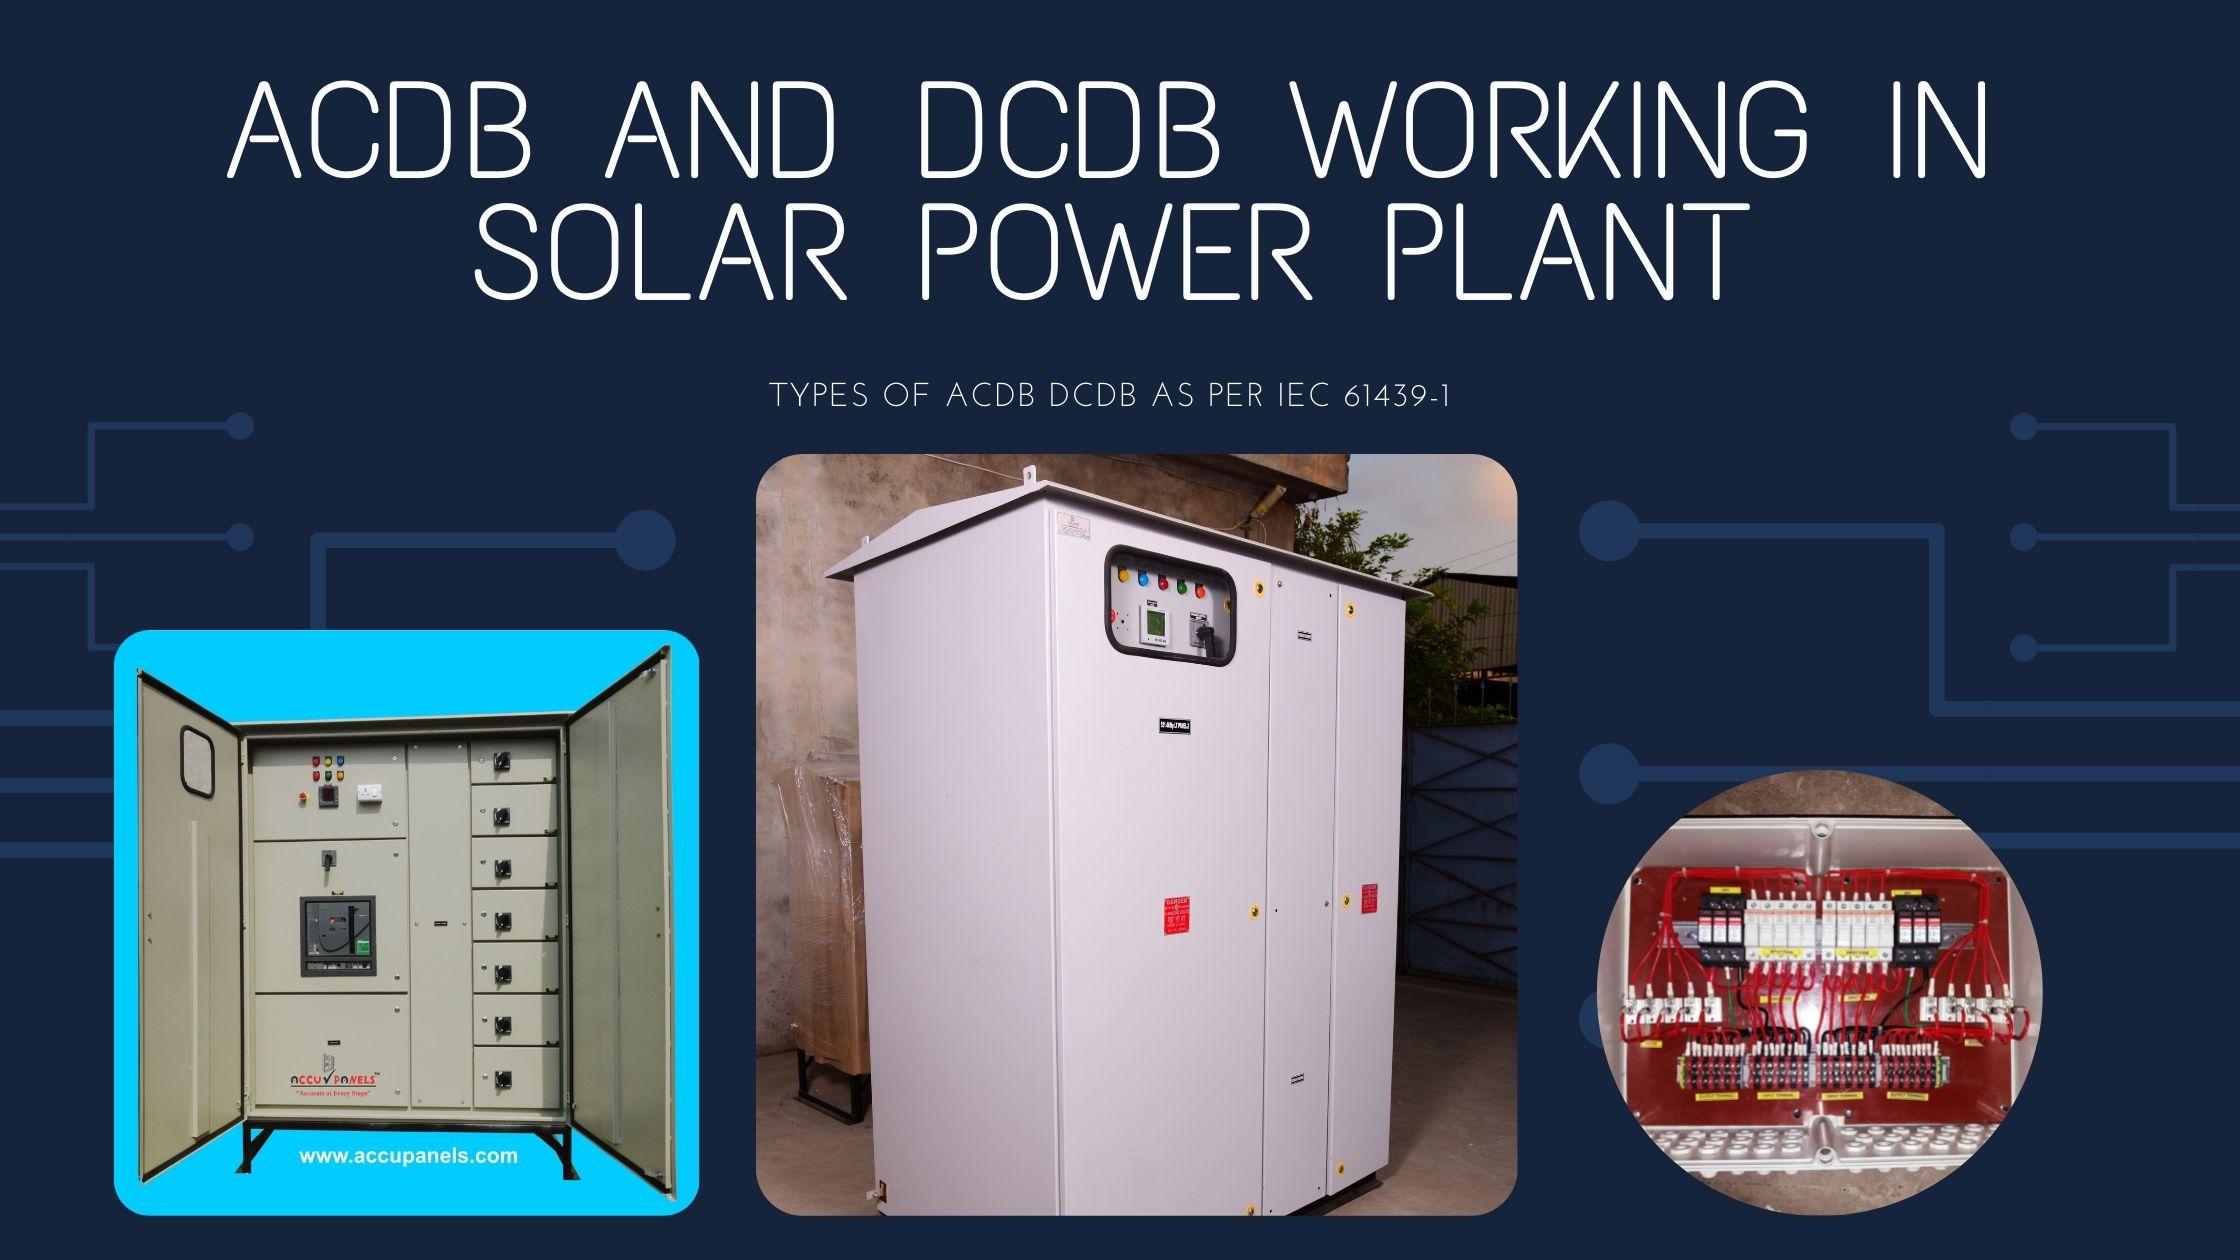 ACDB and DCDB Working in Solar Power Plant: